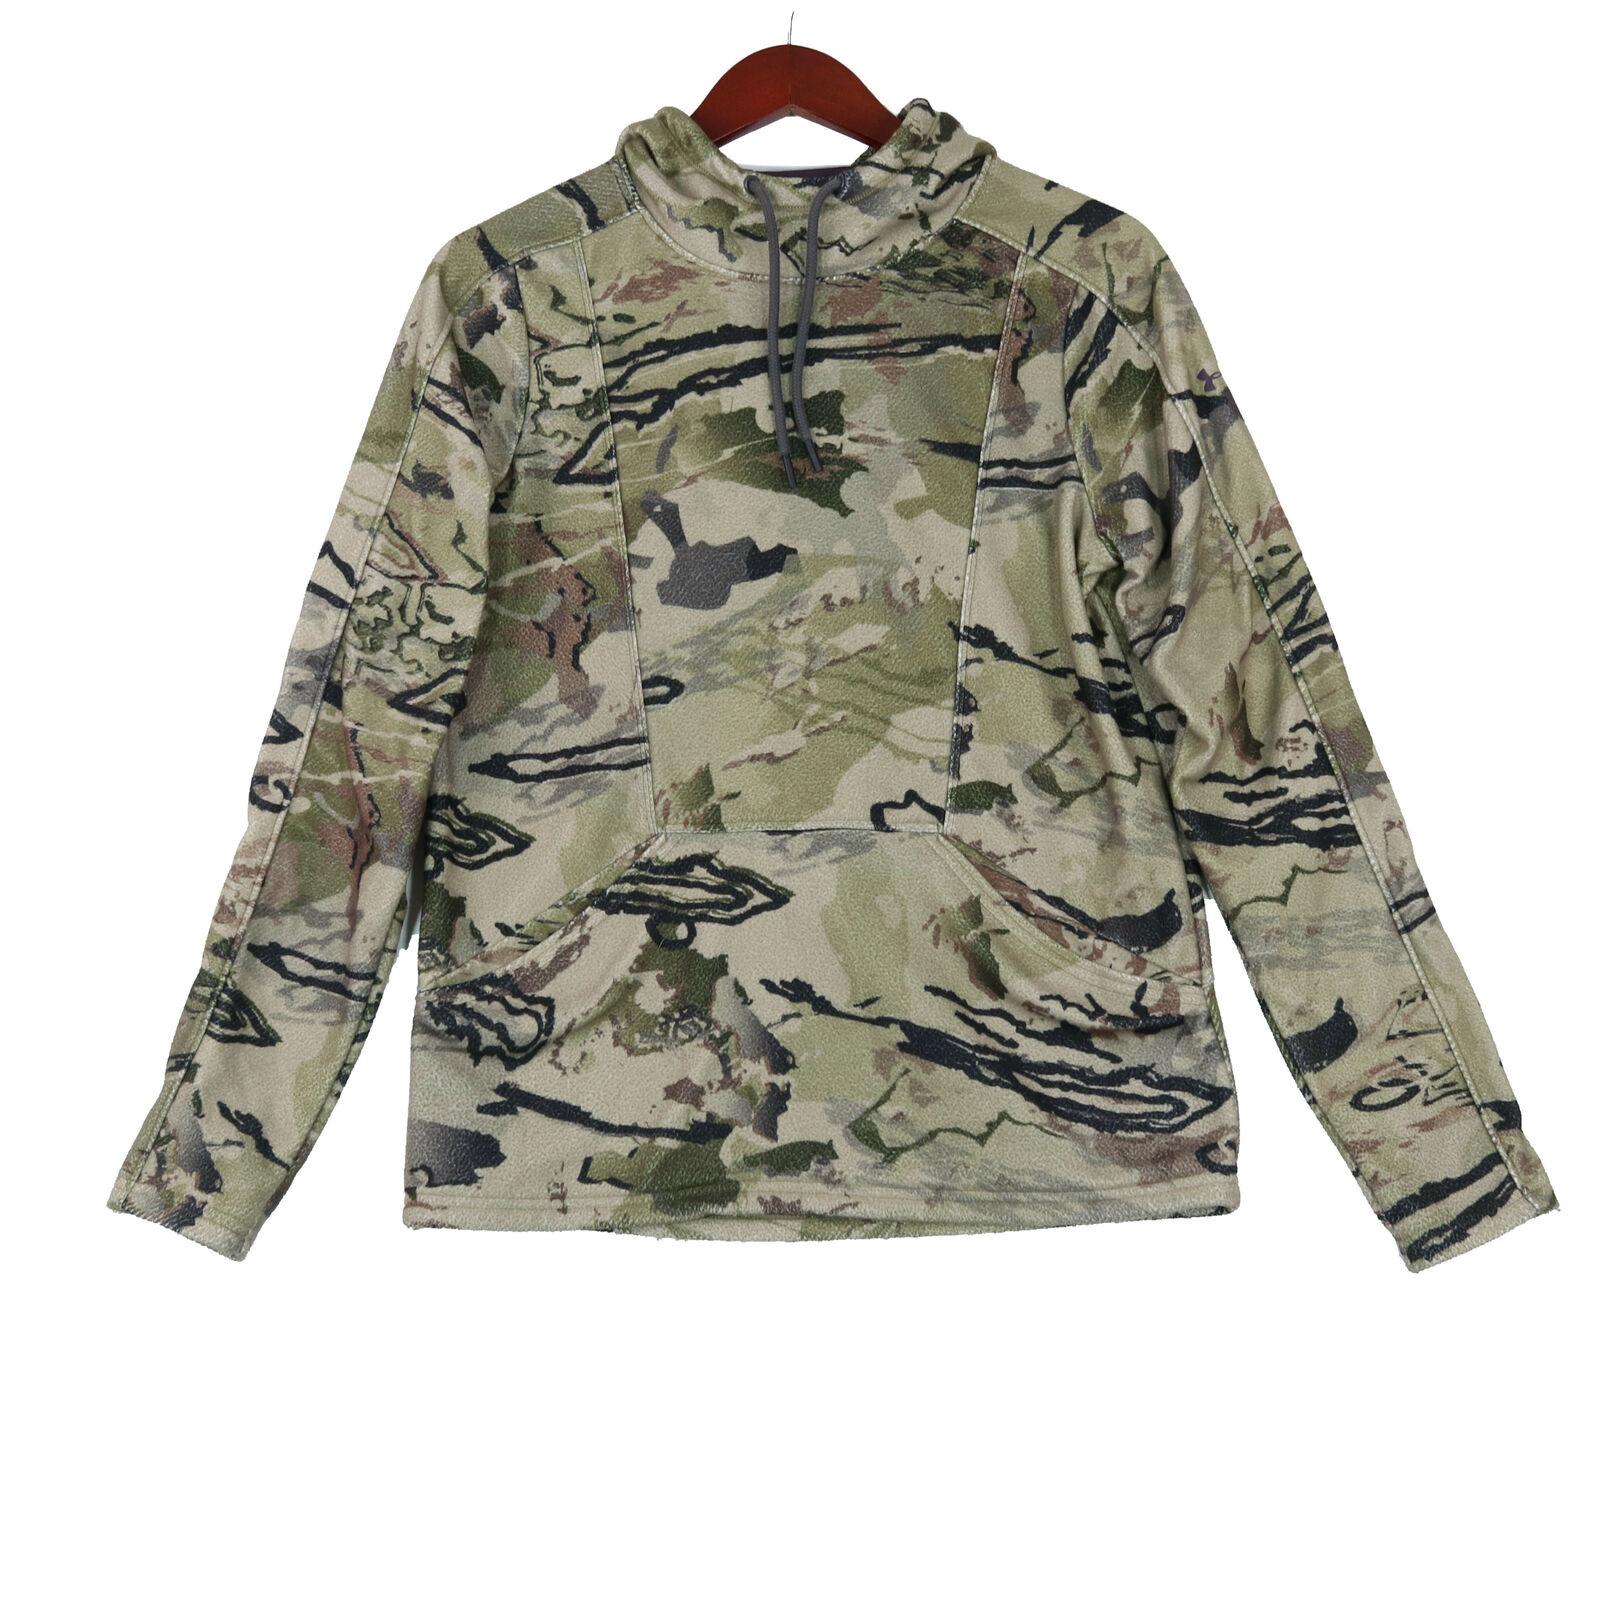 Under Armour Women's Green Women's Camo Fleece Hoodie Sweatshirt - Size Small